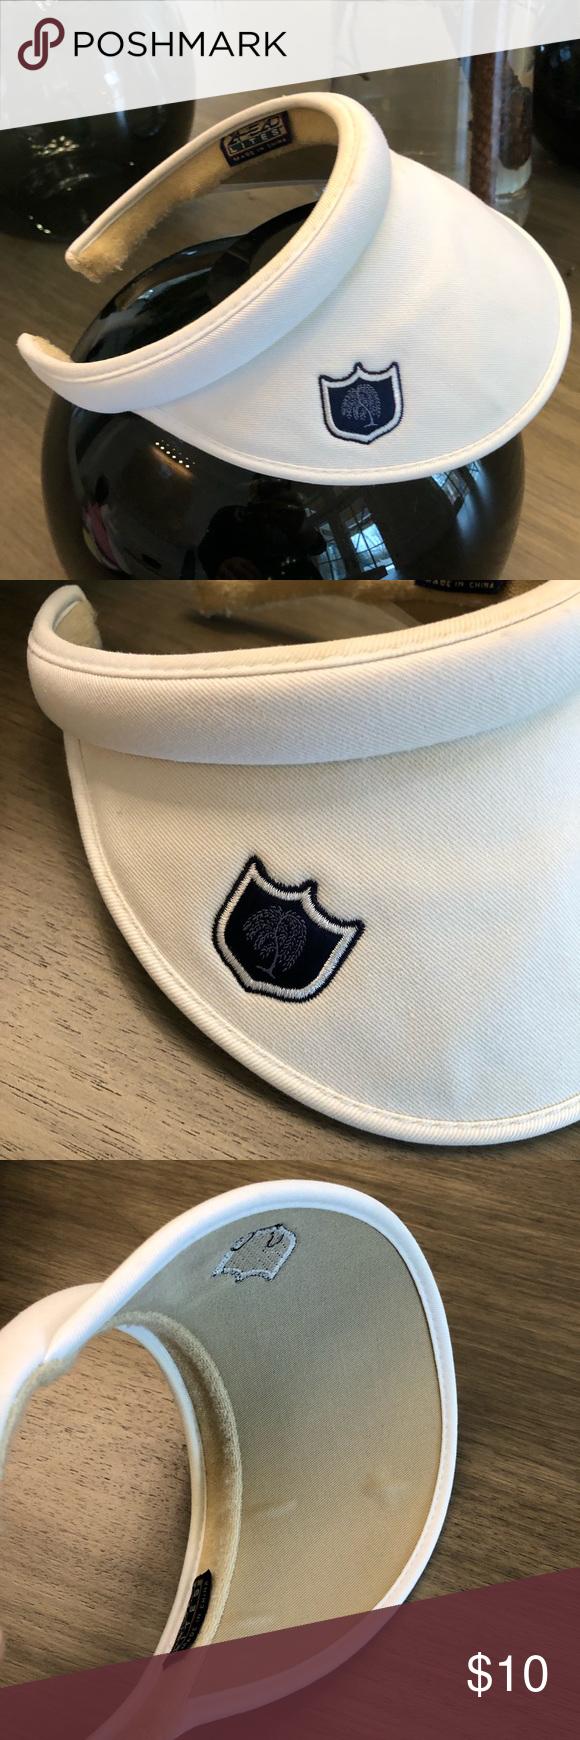 37+ Ahead golf visors viral